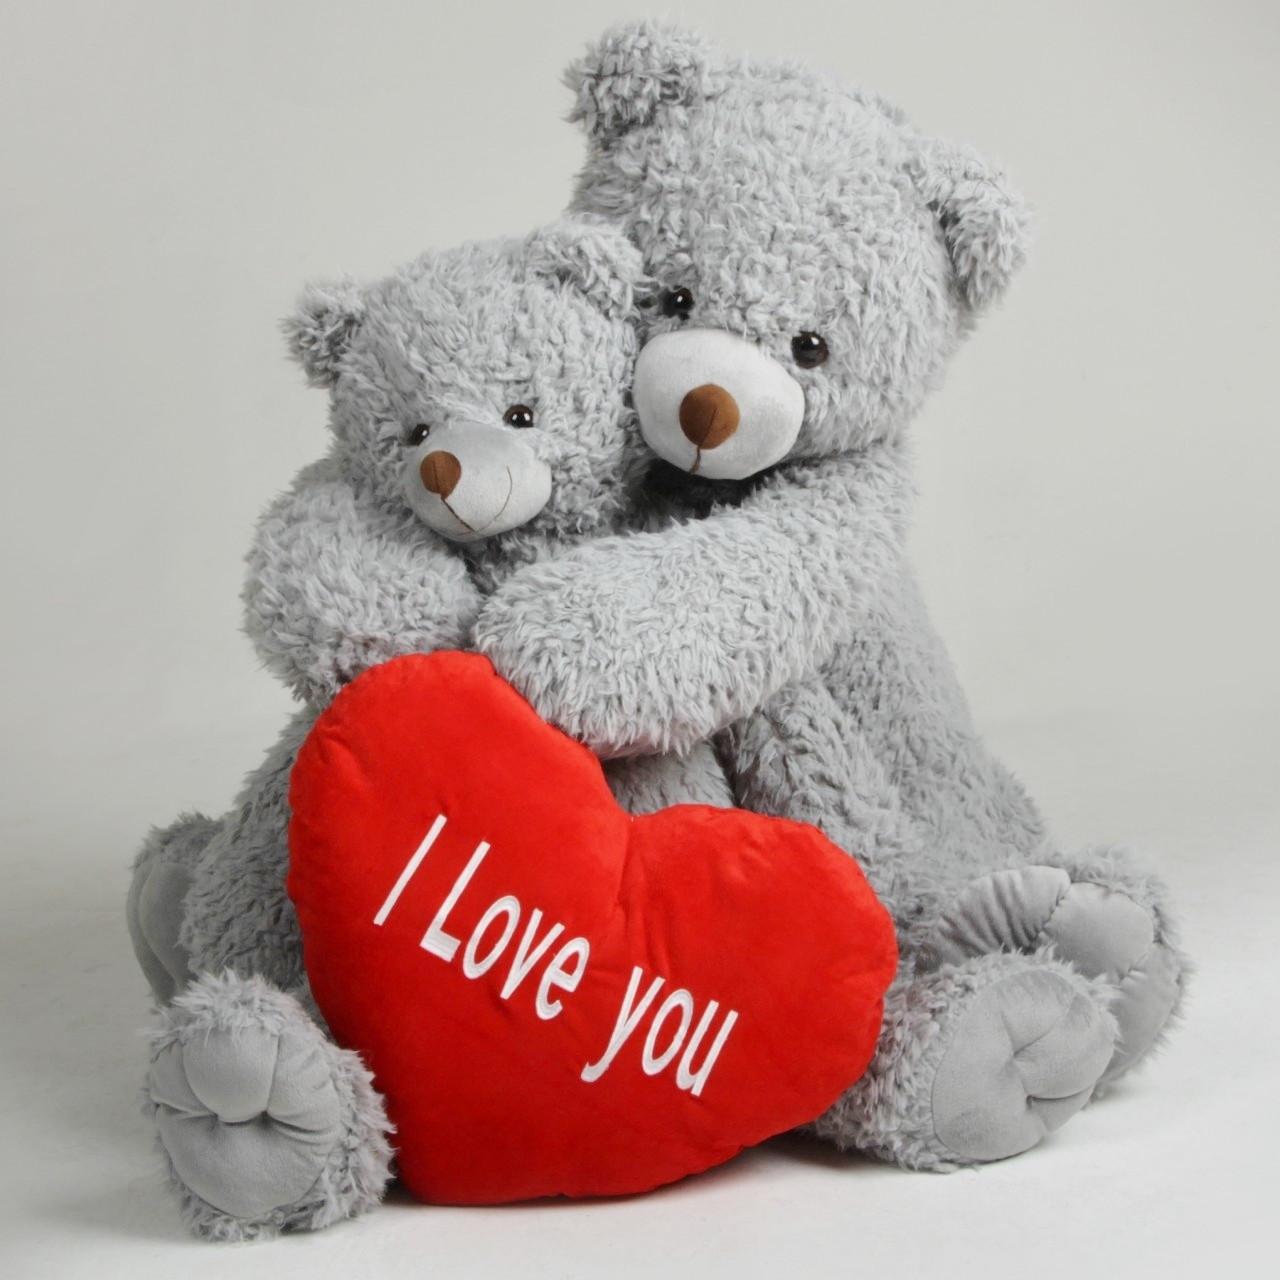 Sugar kisses valentines teddy bears with heart i love you woolly sugar kisses valentines teddy bears with heart i love you woolly tubs 42 inch and 32 inch altavistaventures Images